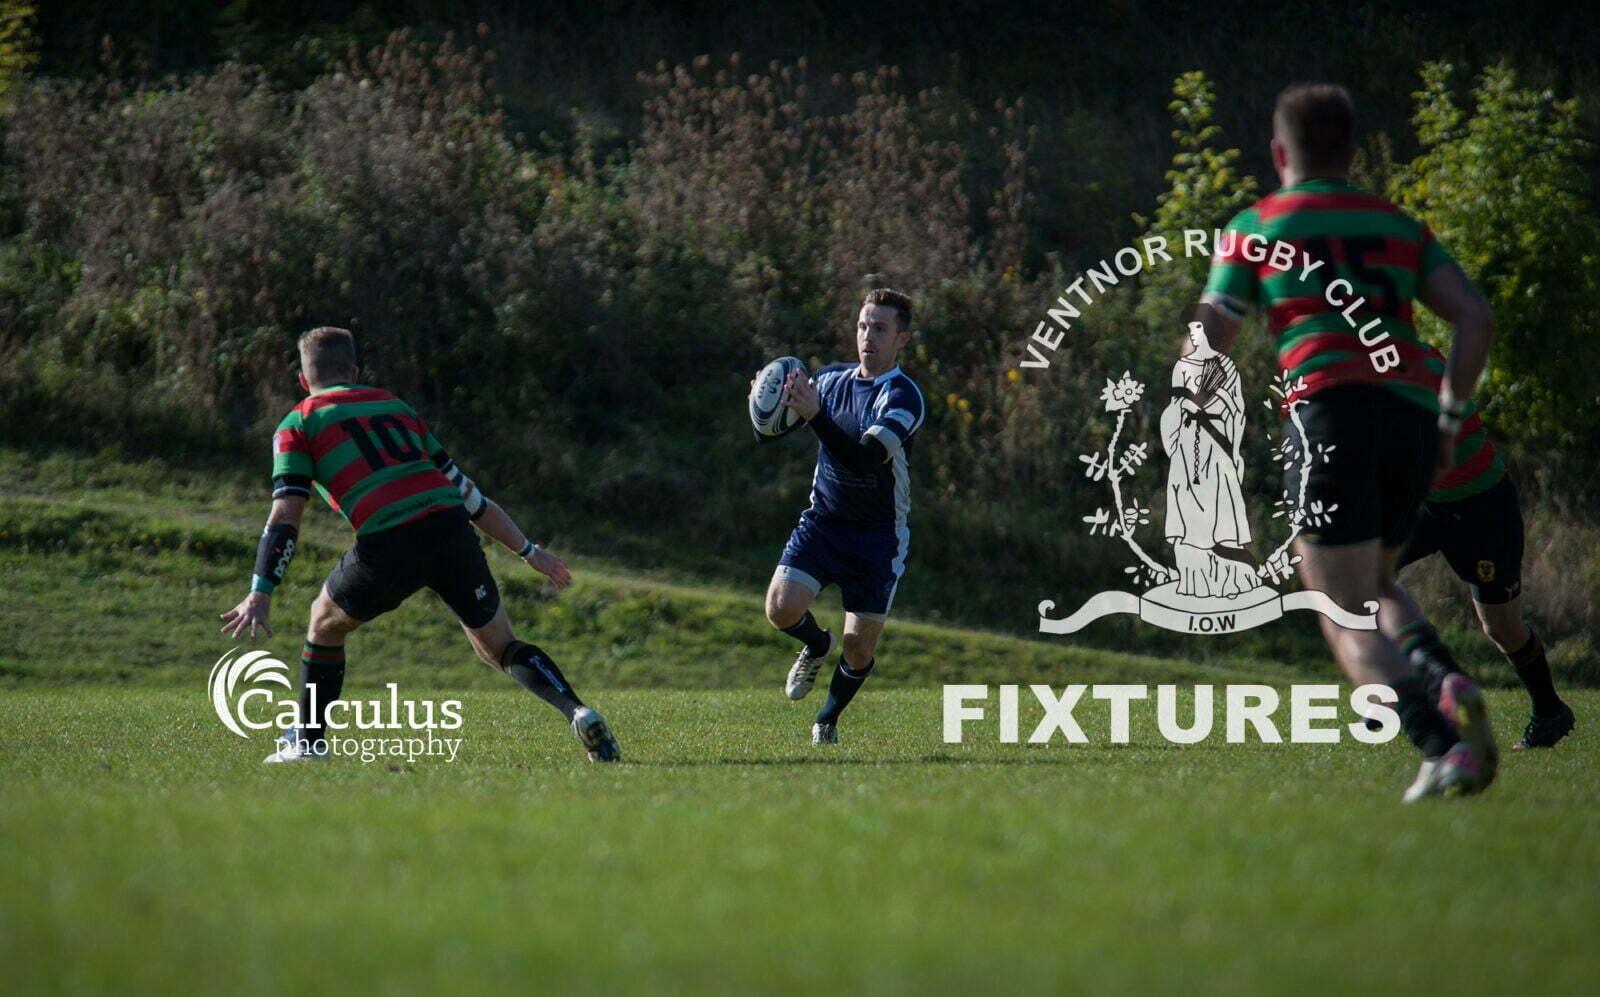 Saturday 25 October 2014 Fixtures